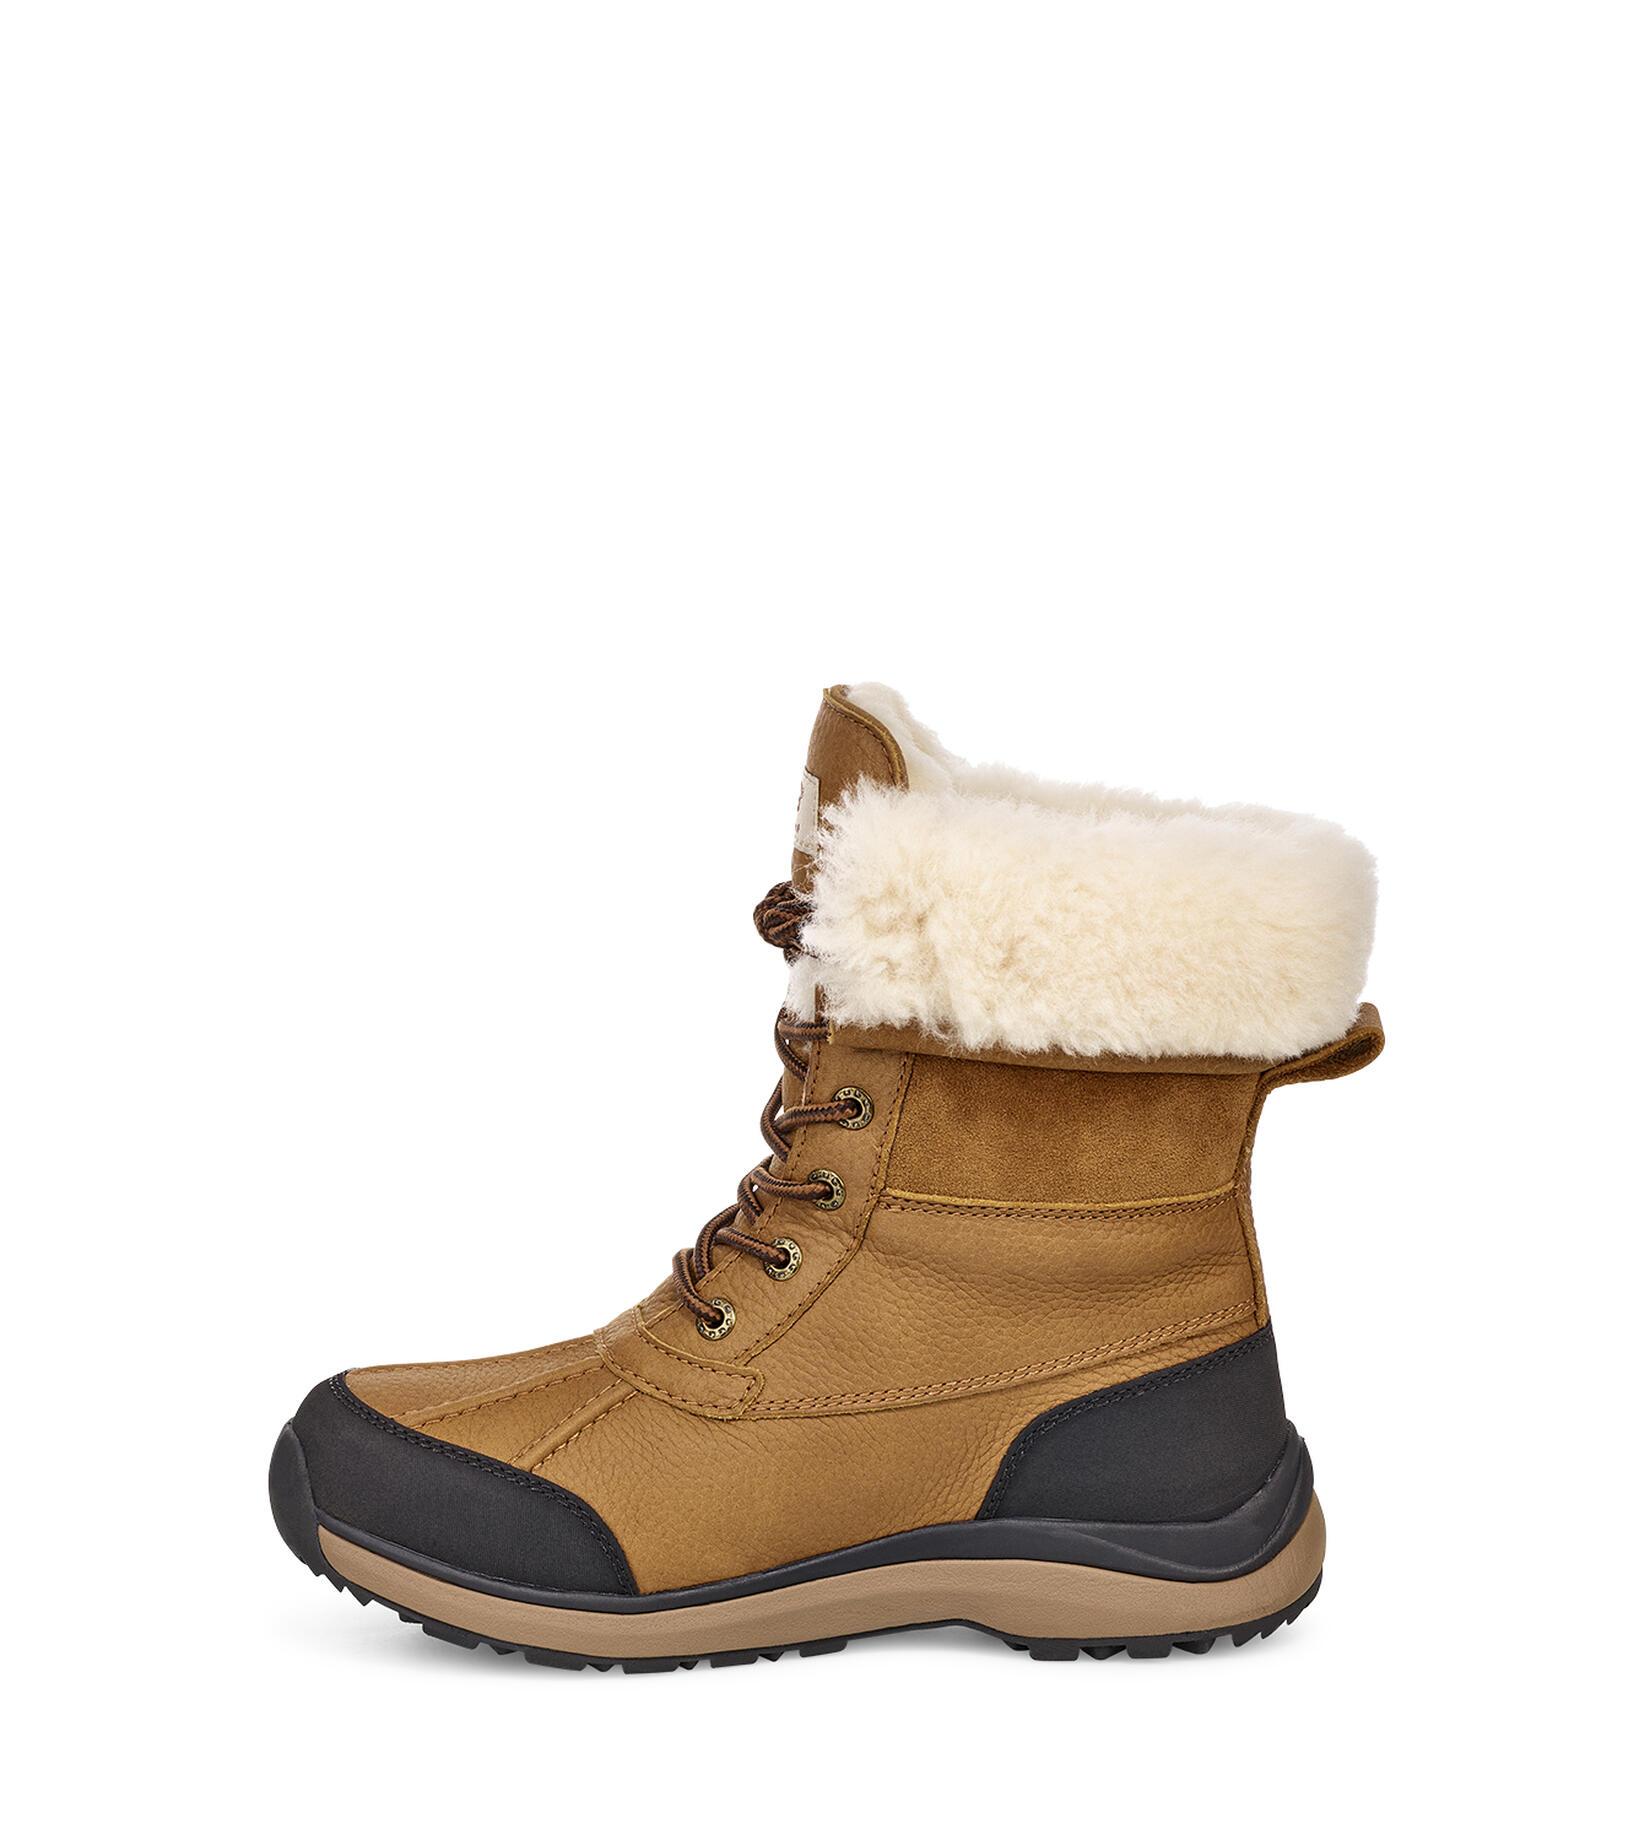 Adirondack III Stivali Invernali